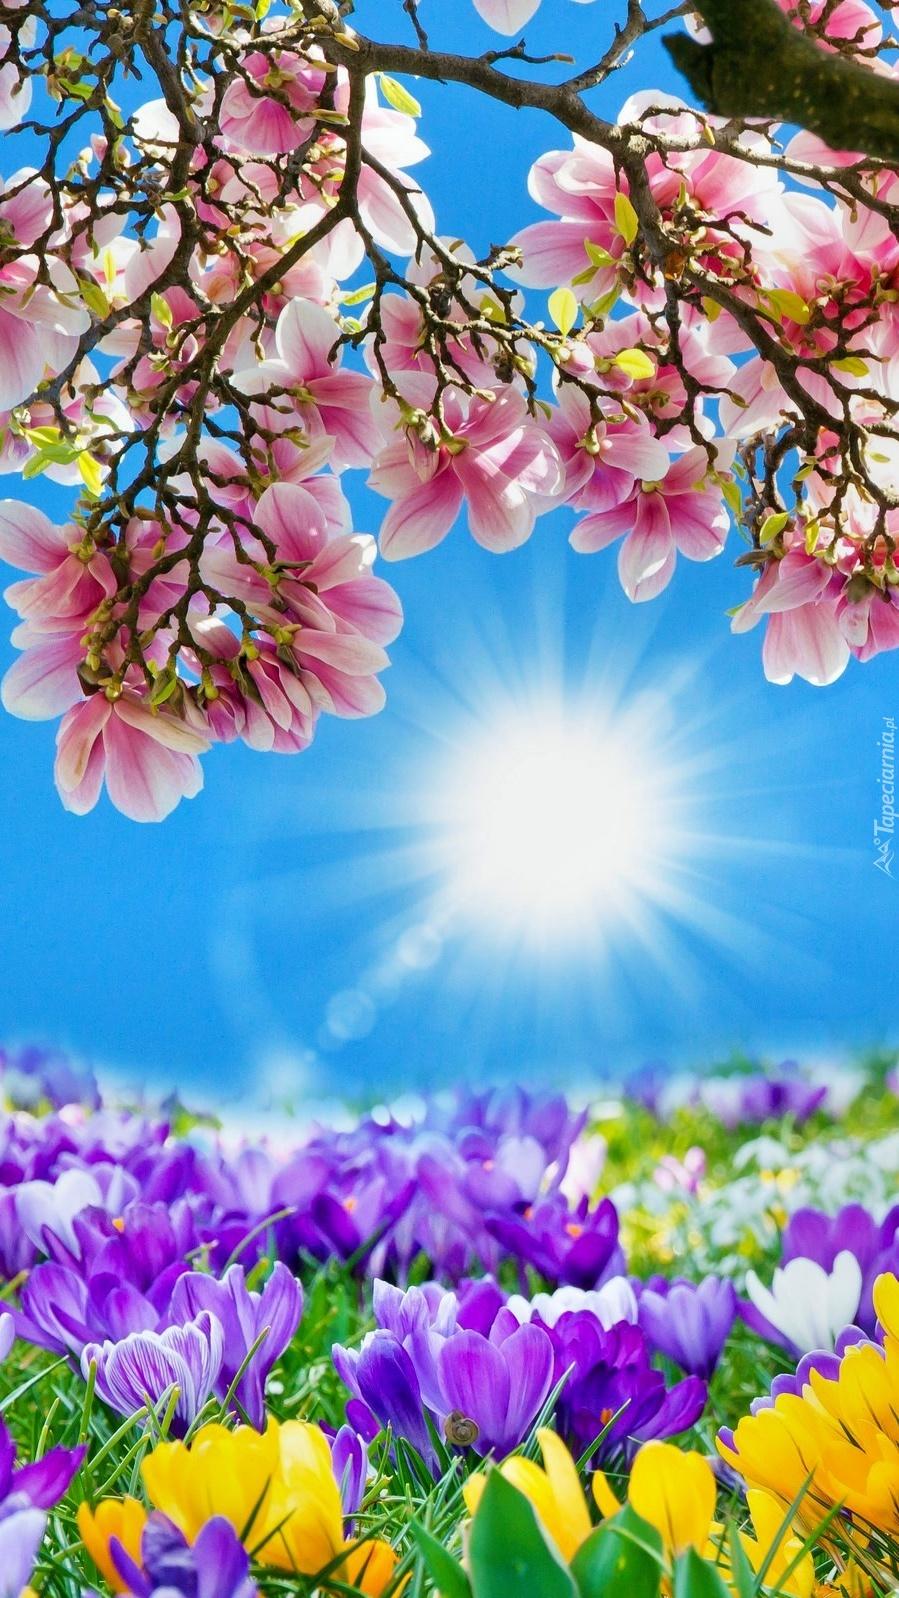 Chłodny Piękny obraz wiosny - Tapeta na telefon UQ93